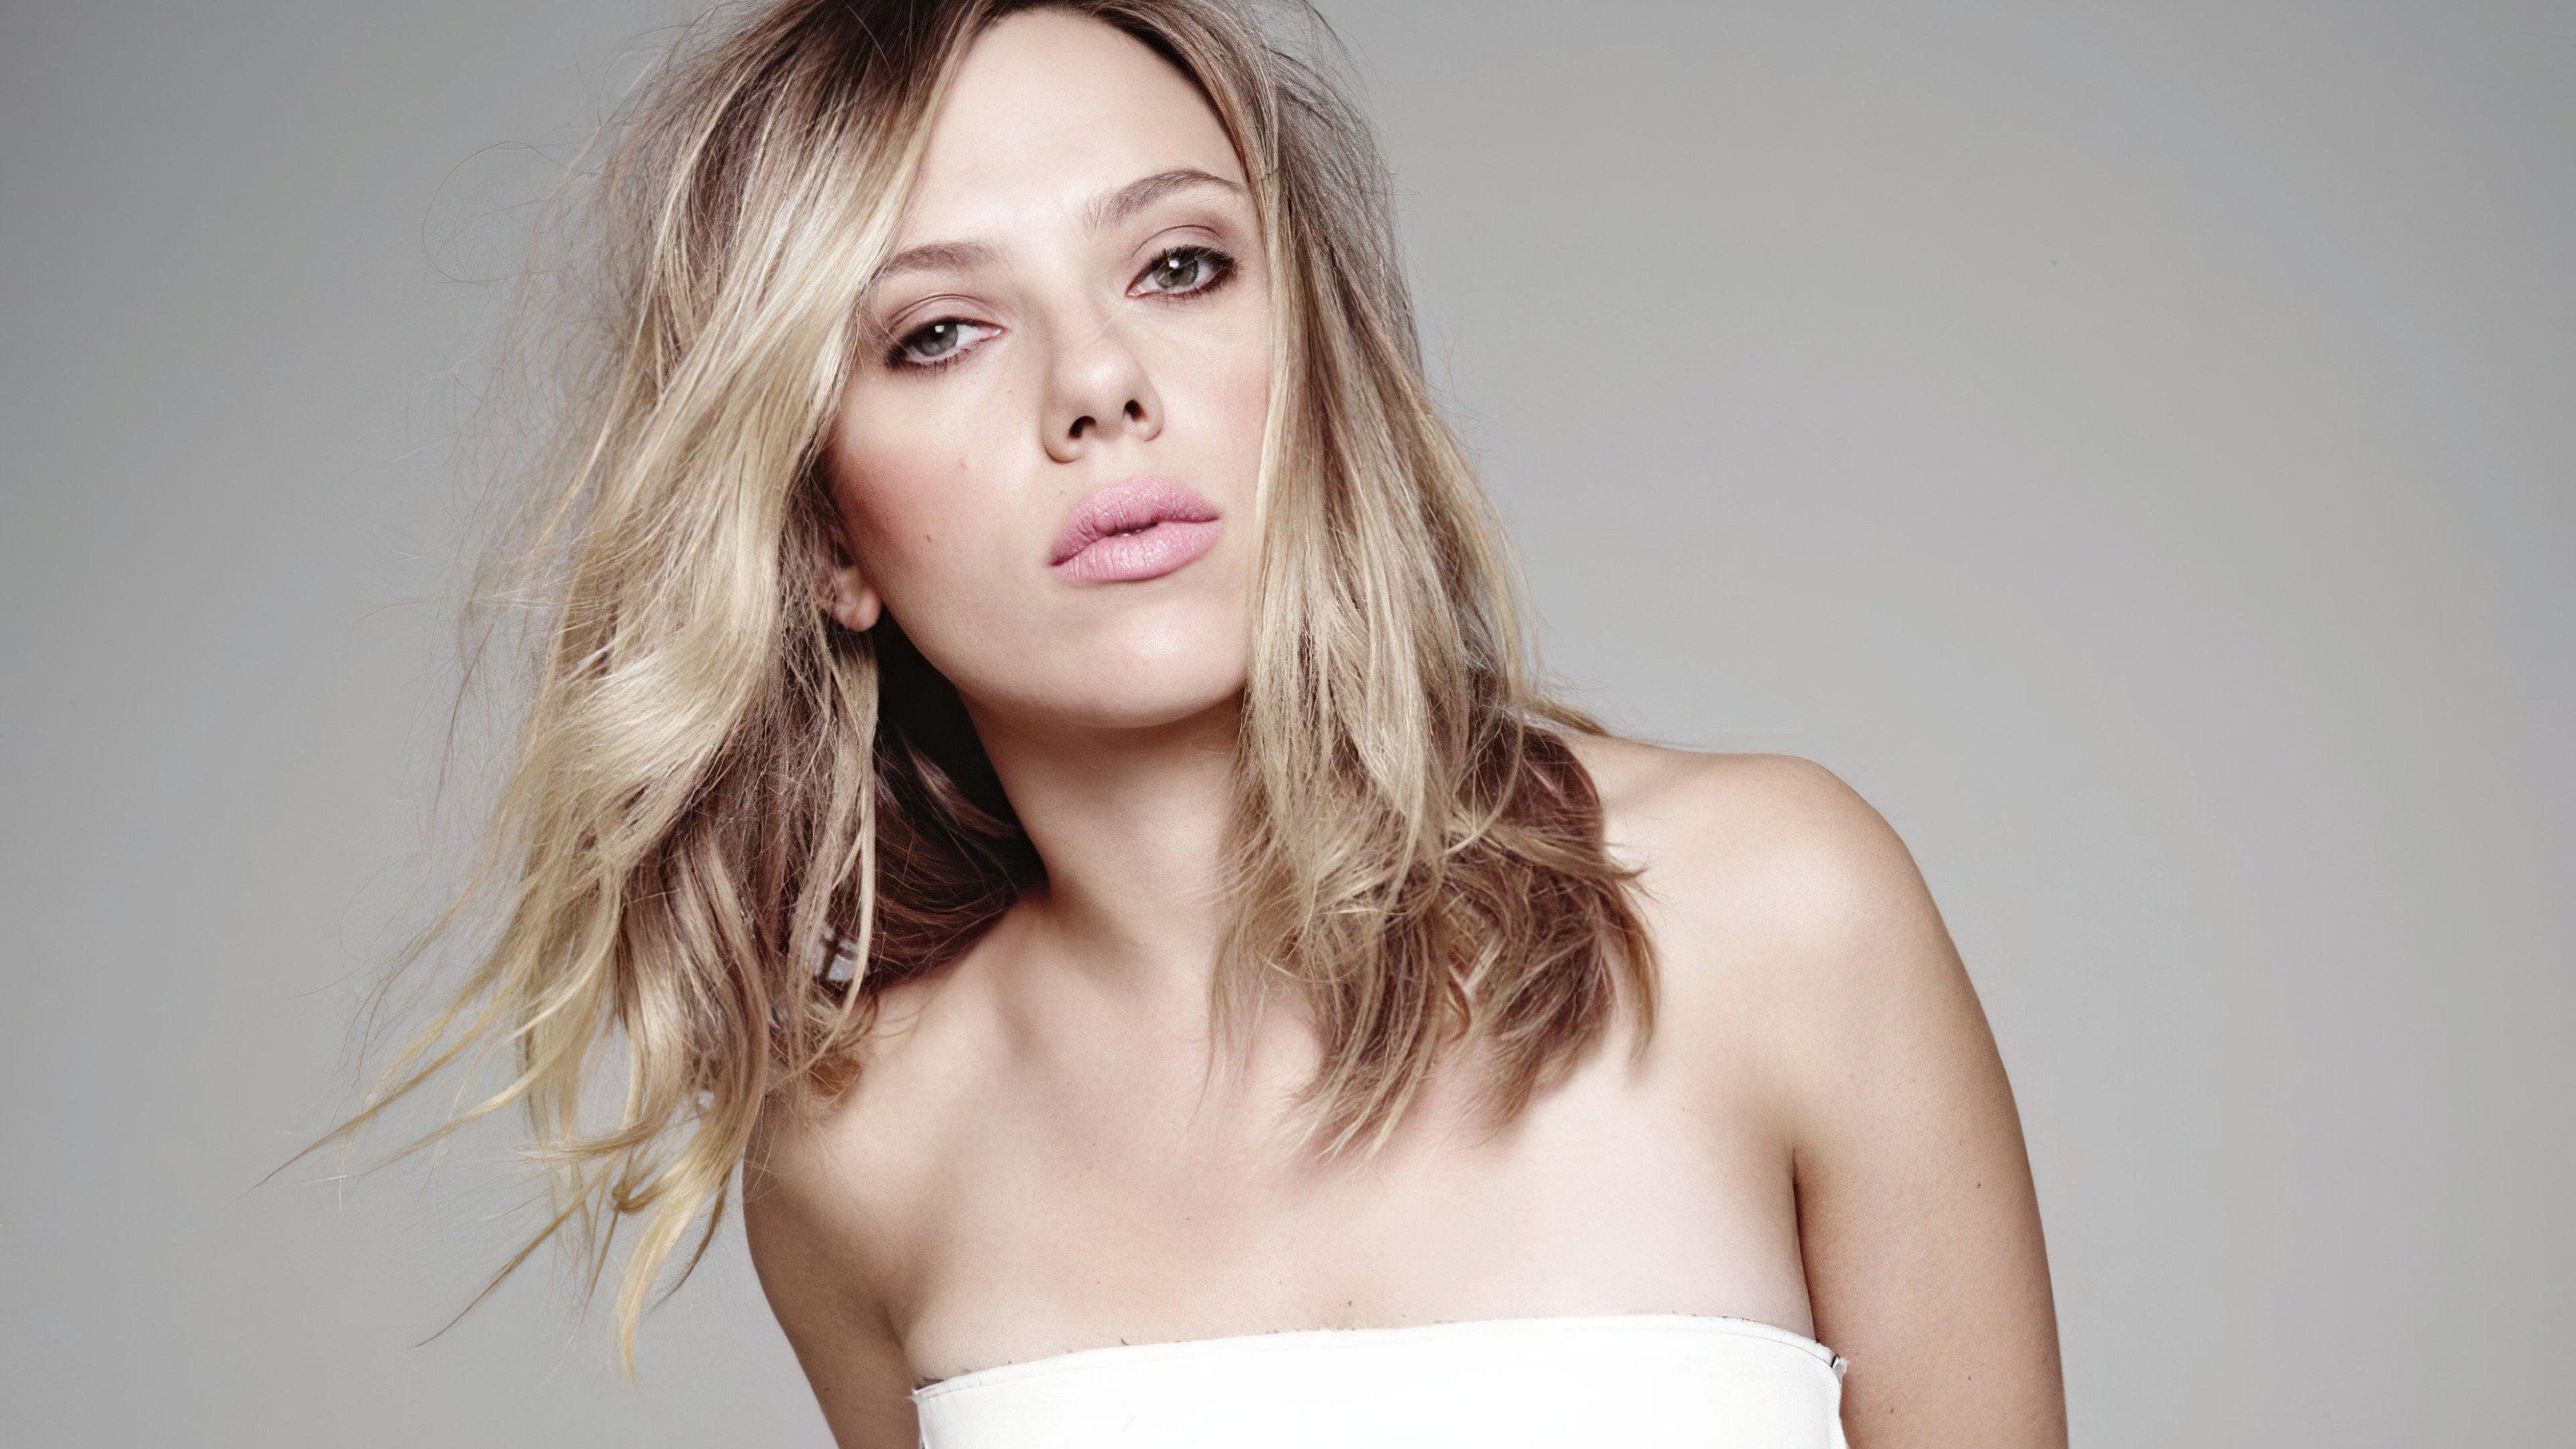 Wallpaper Actress Scarlett Johansson